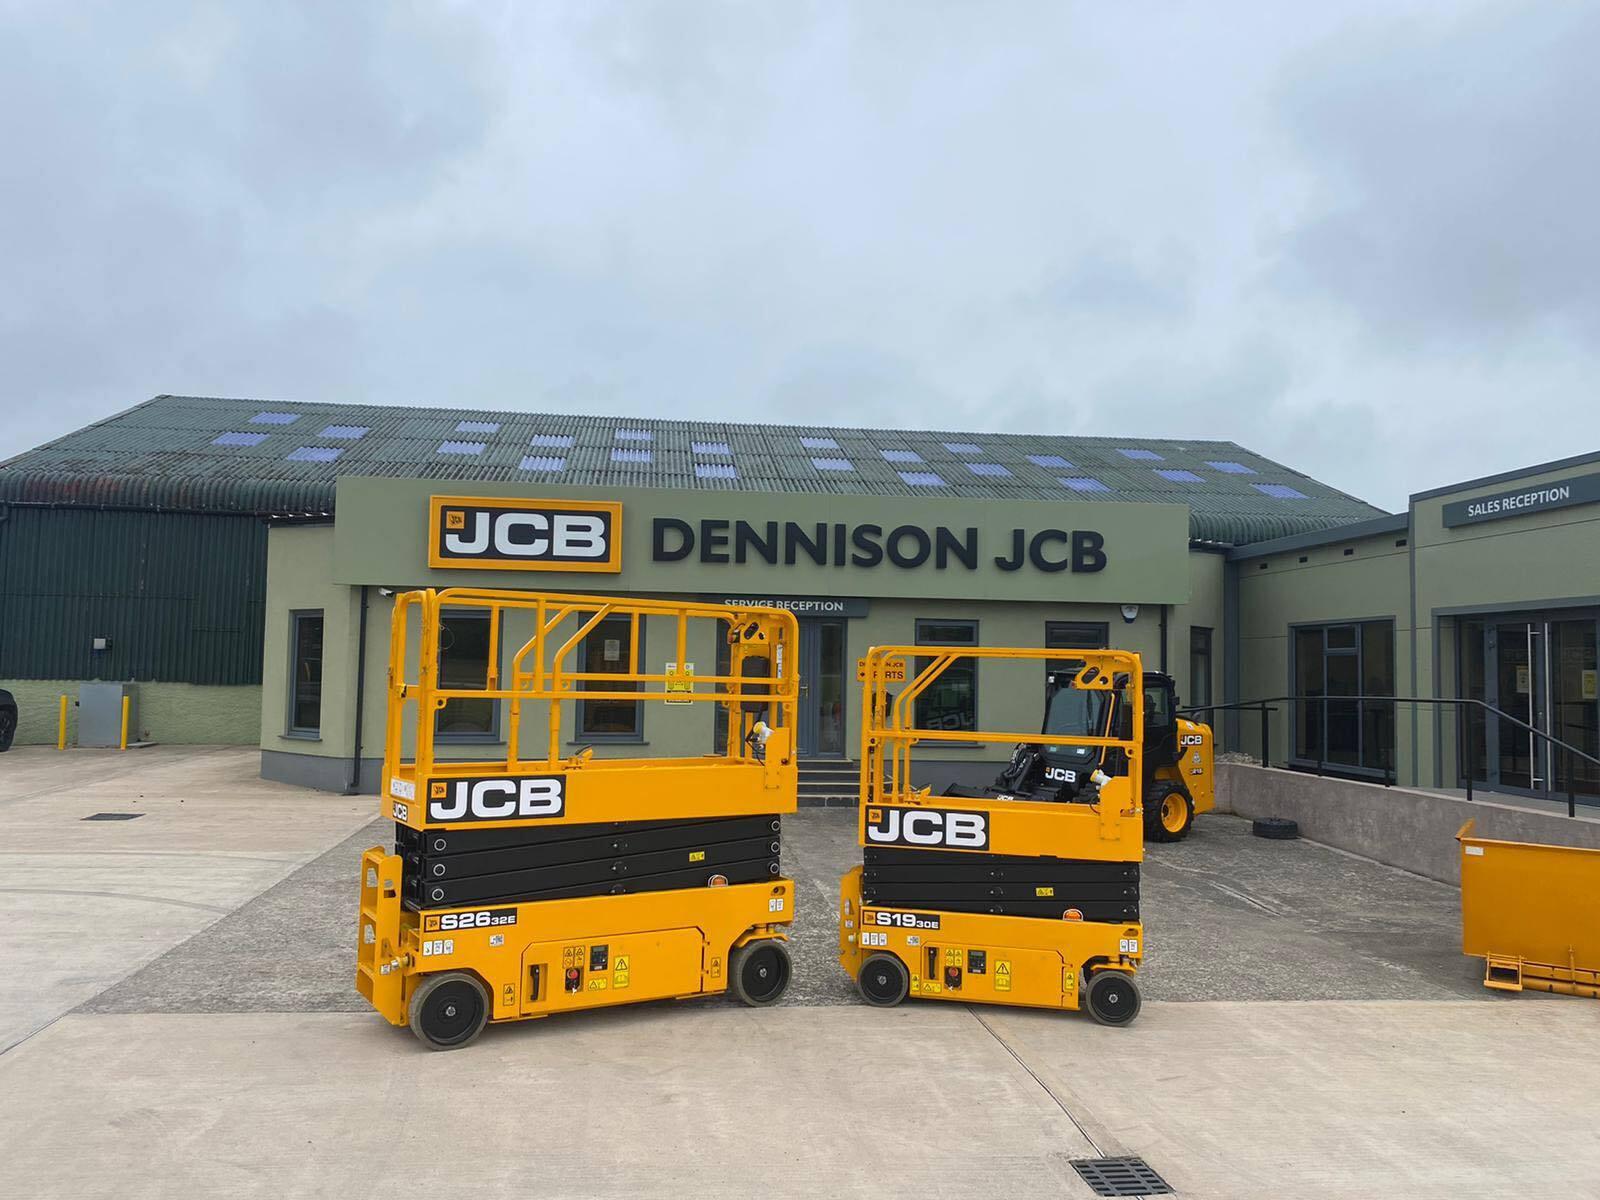 JCB New Access Platforms